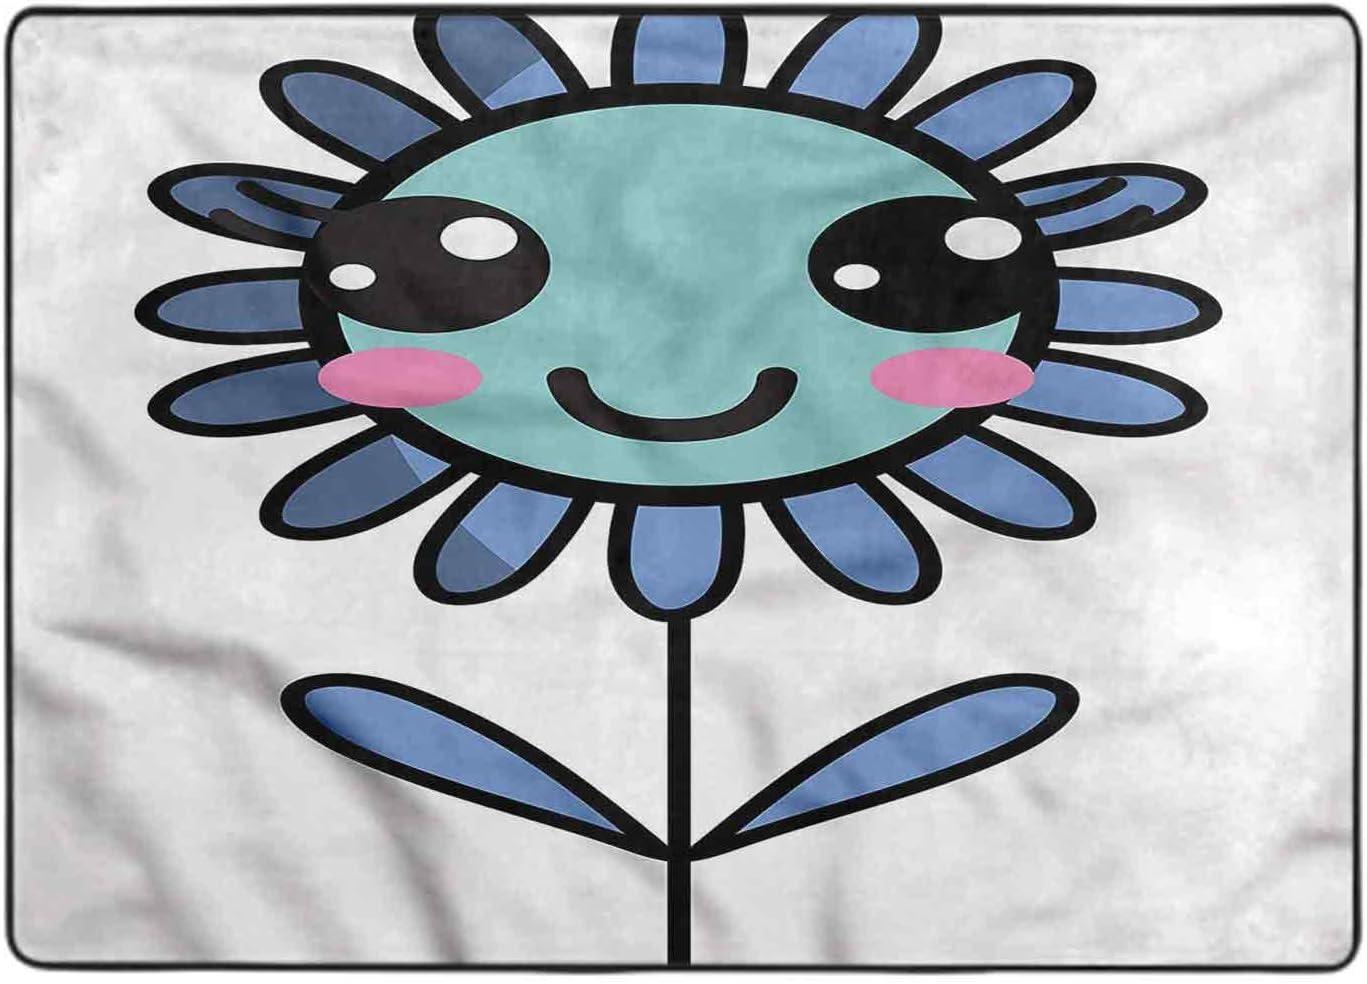 Bedroom Area Rug Kawaii Leaves and Petals Ar 6 Feet 4 by Tulsa Mall Free shipping on posting reviews Cartoon